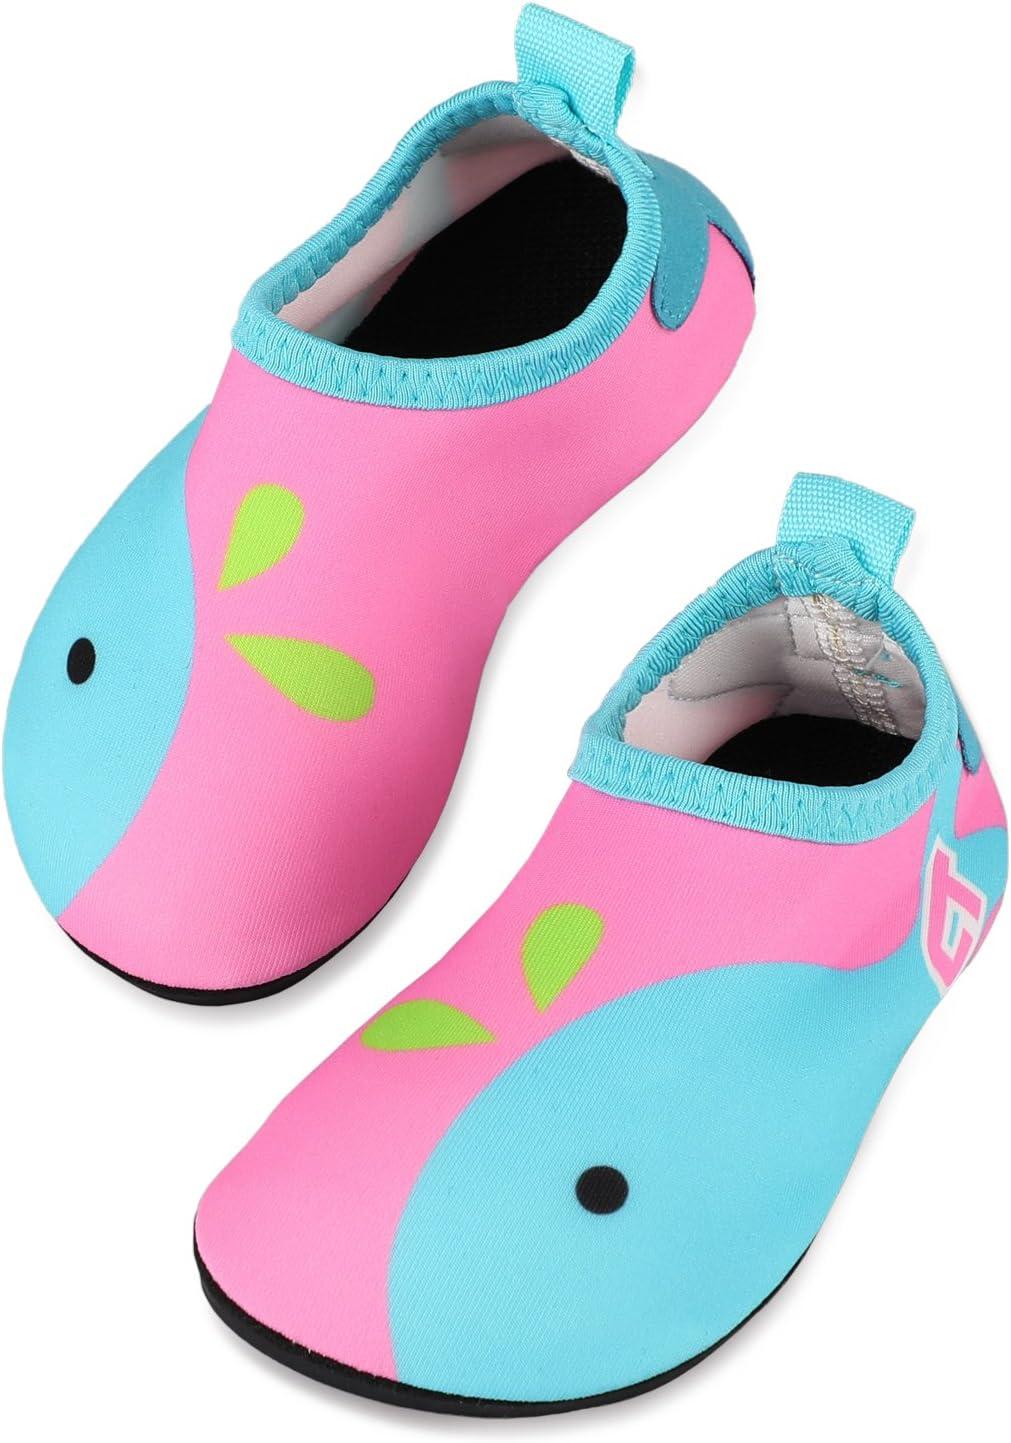 TAGVO Baby Boys Girls Water Shoes, Non-Slip Swim Shoes Barefoot Skin Aqua Socks for Beach Swim Pool Toddler Kids